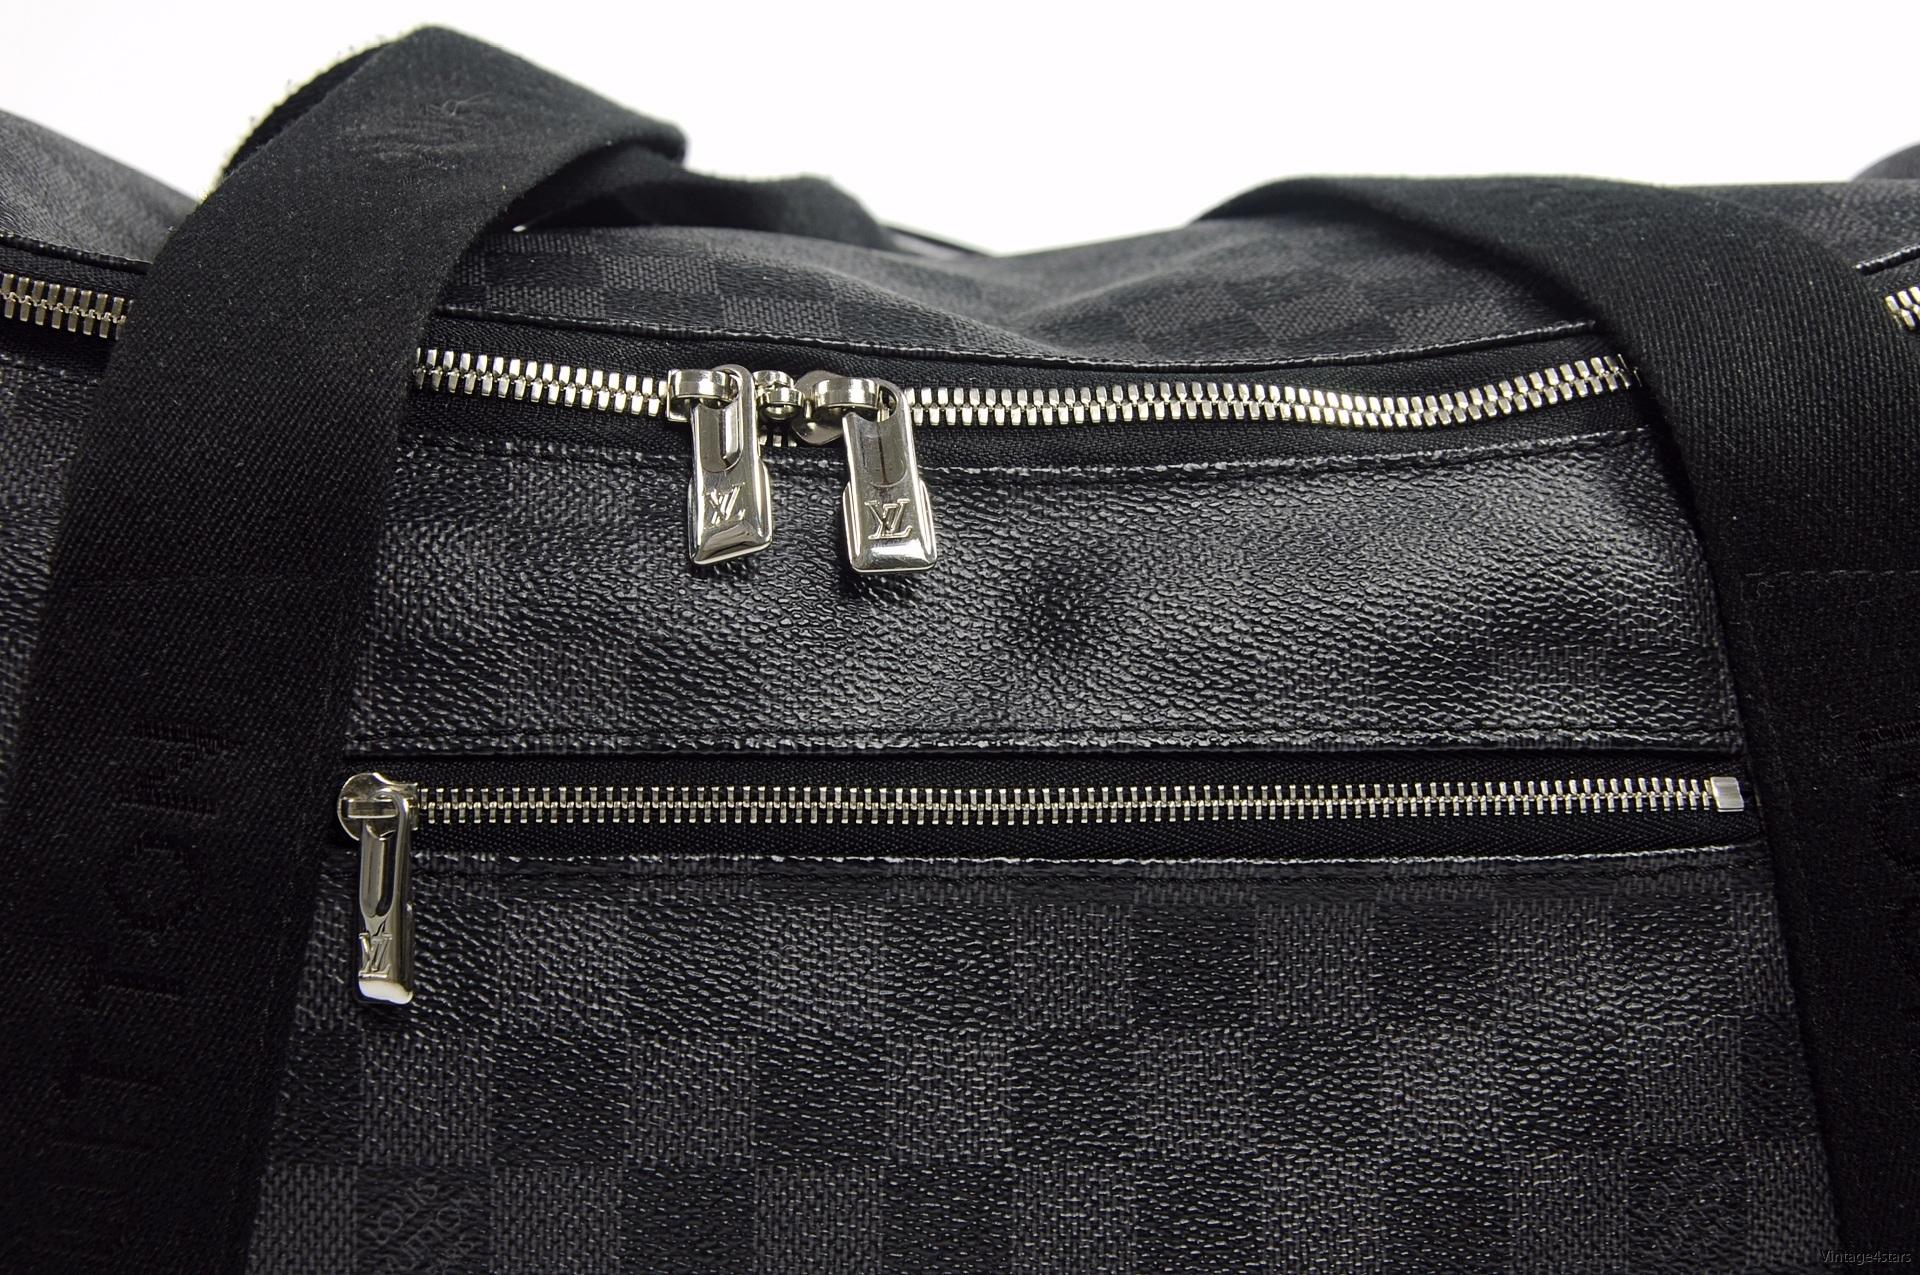 Louis Vuitton Eole 55 NEO Graphite 7